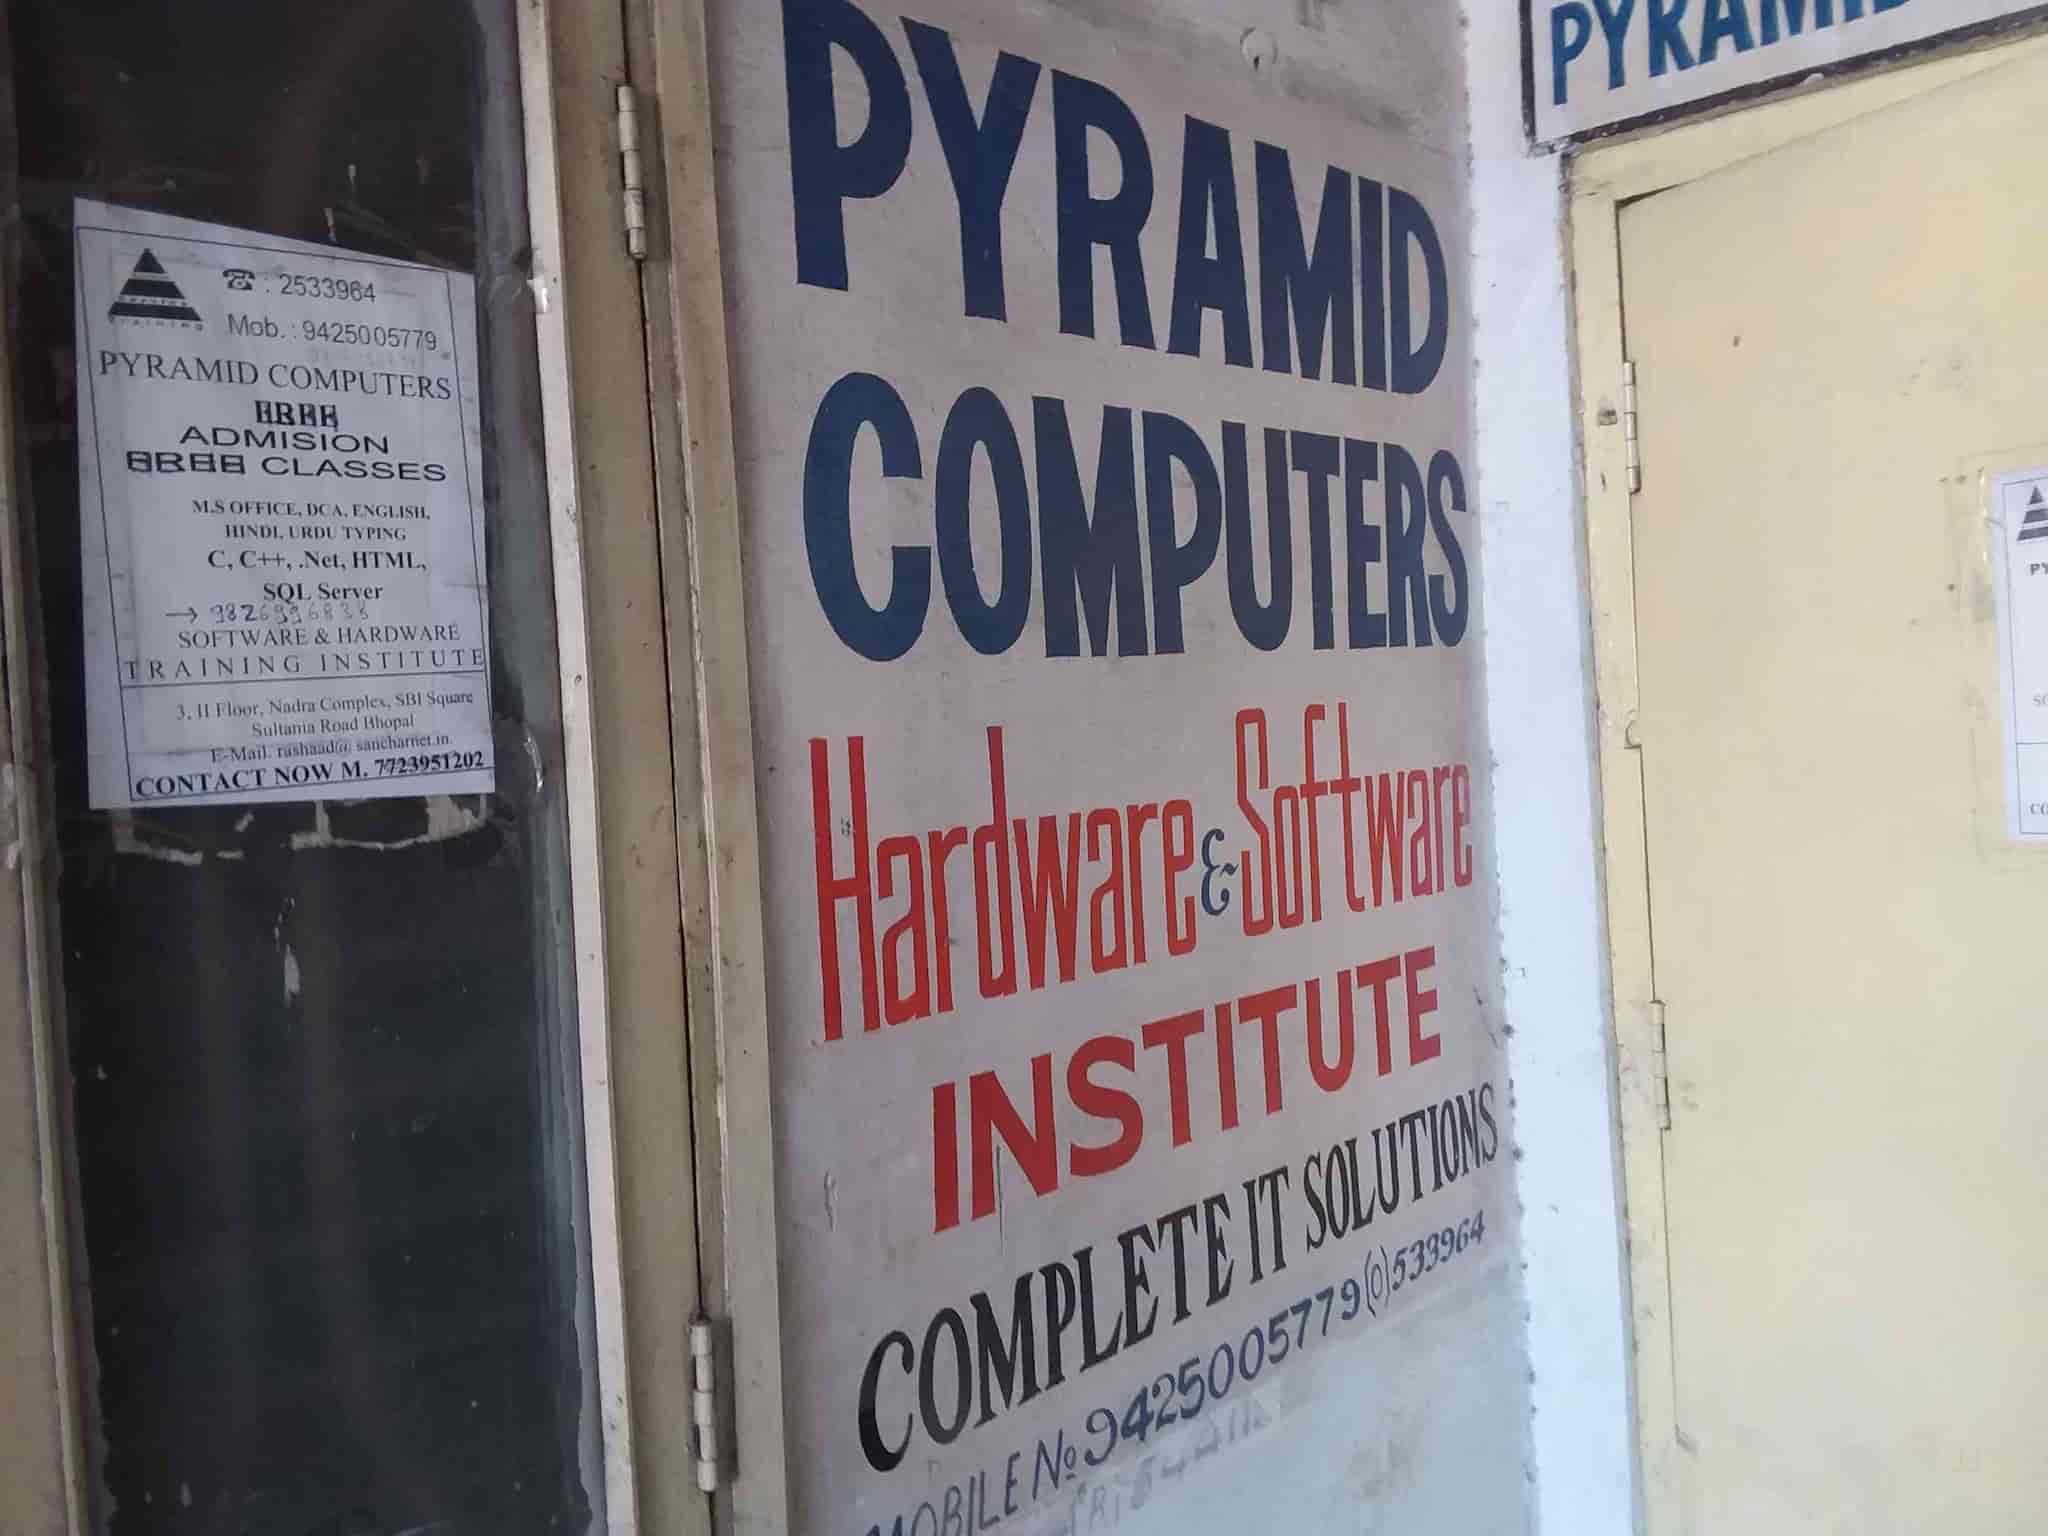 Pyramid Computers, Sultania Road - Computer Training